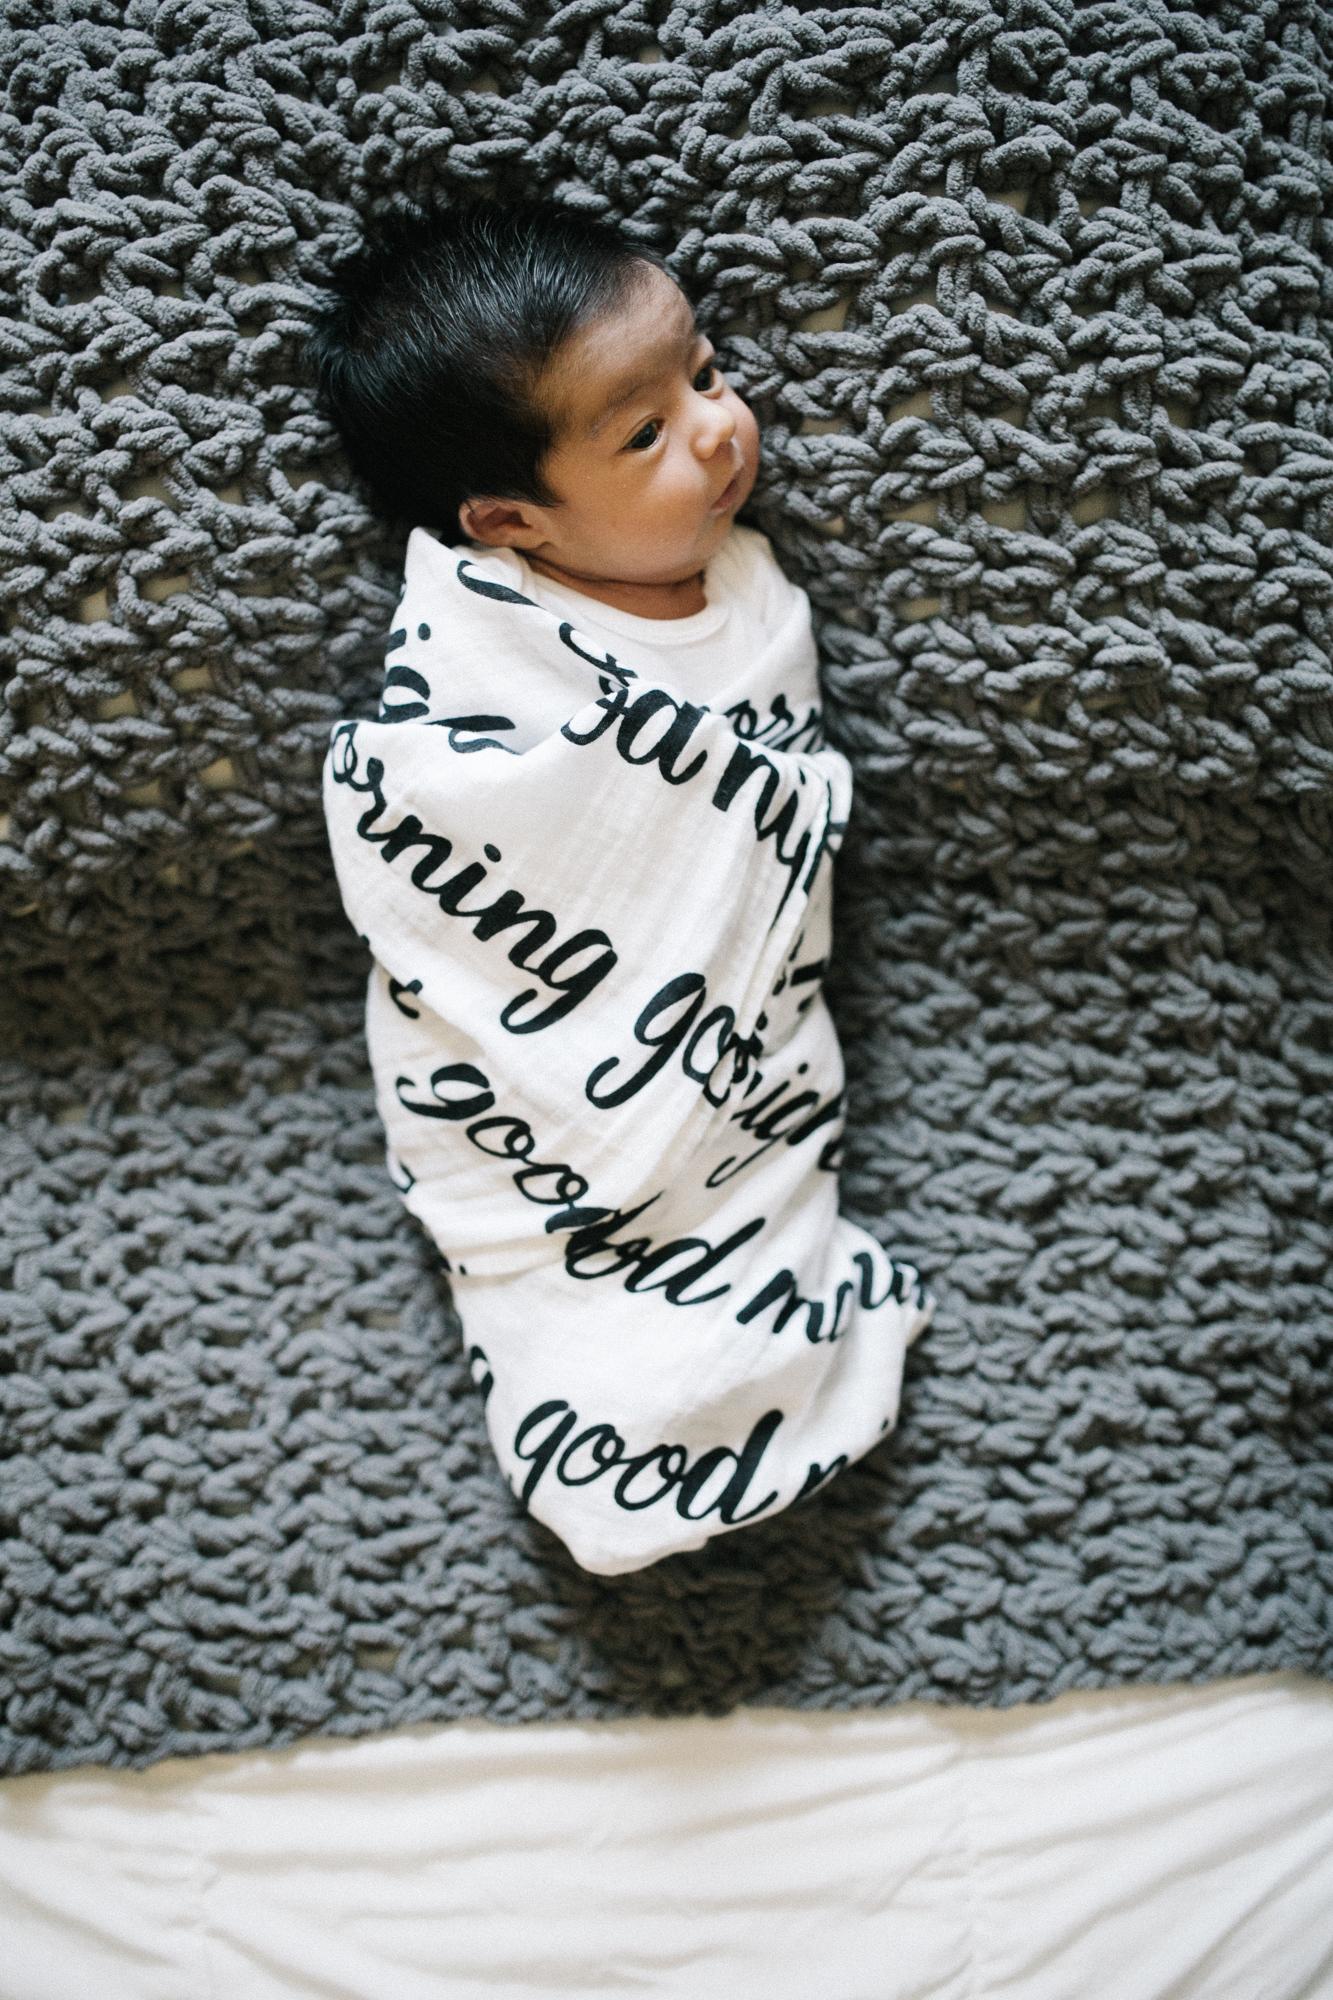 orange_county_newborn_photos-4.jpg